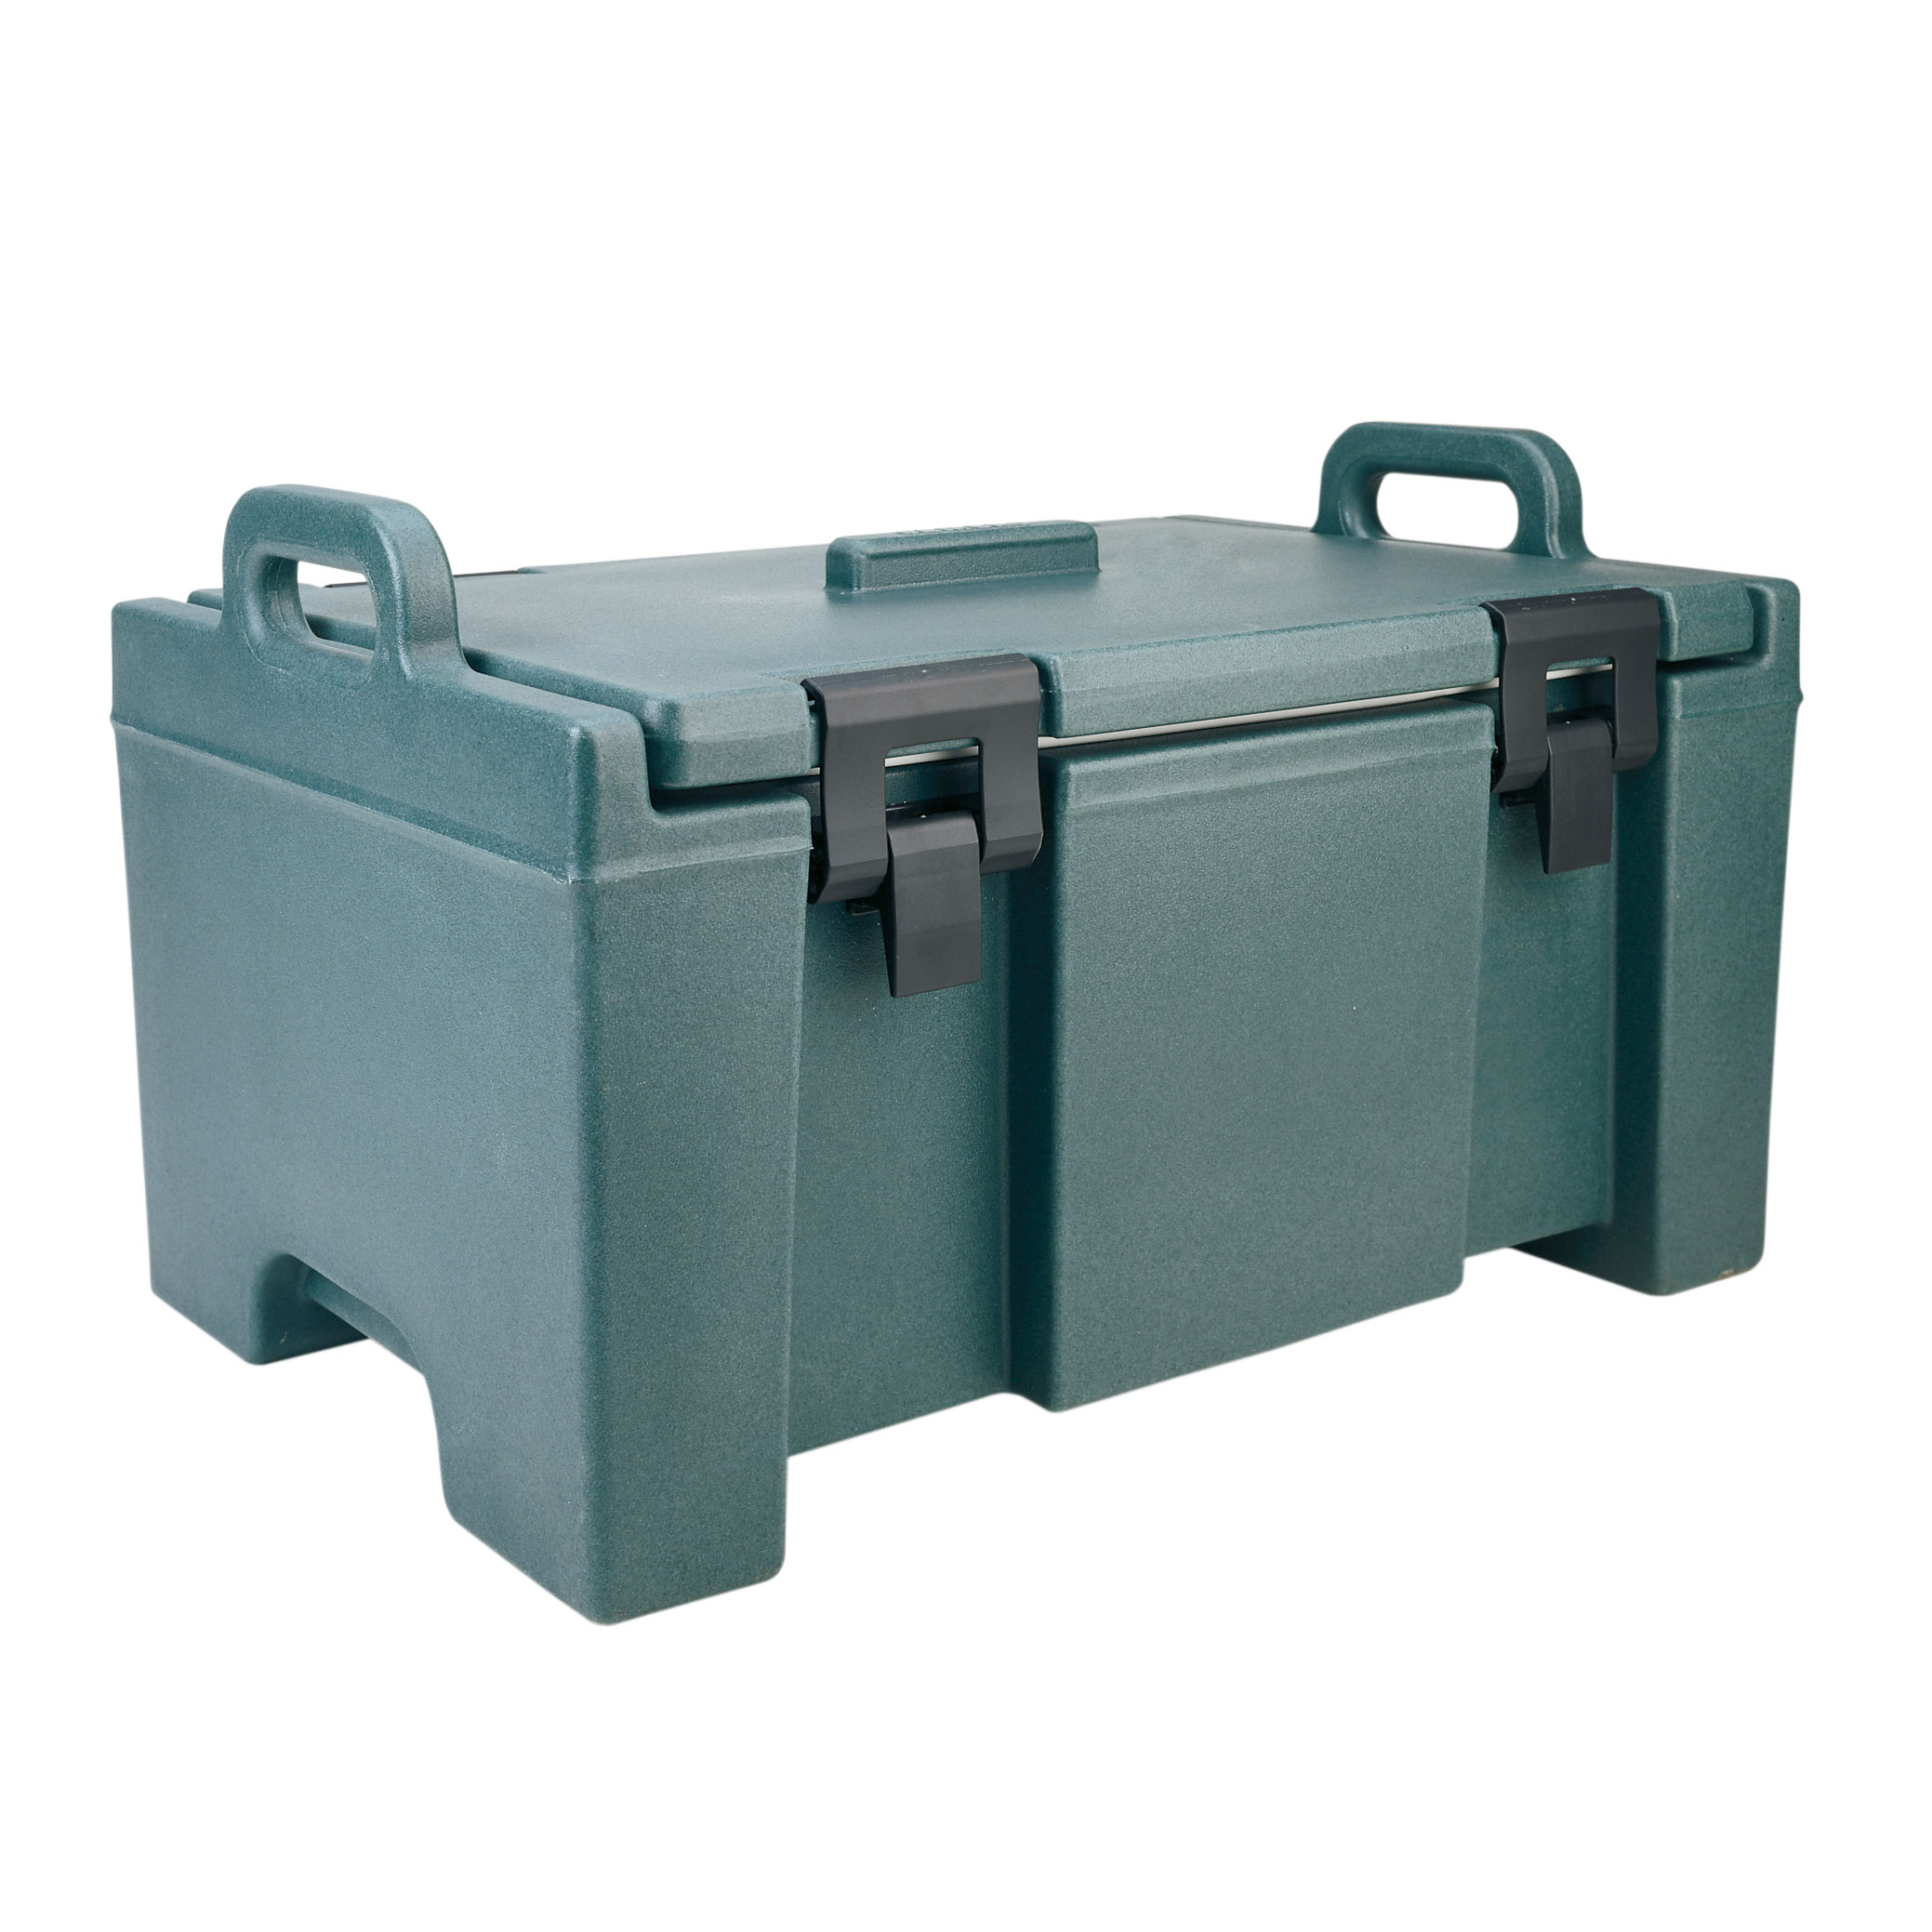 Cambro UPC100192 food pan carriers